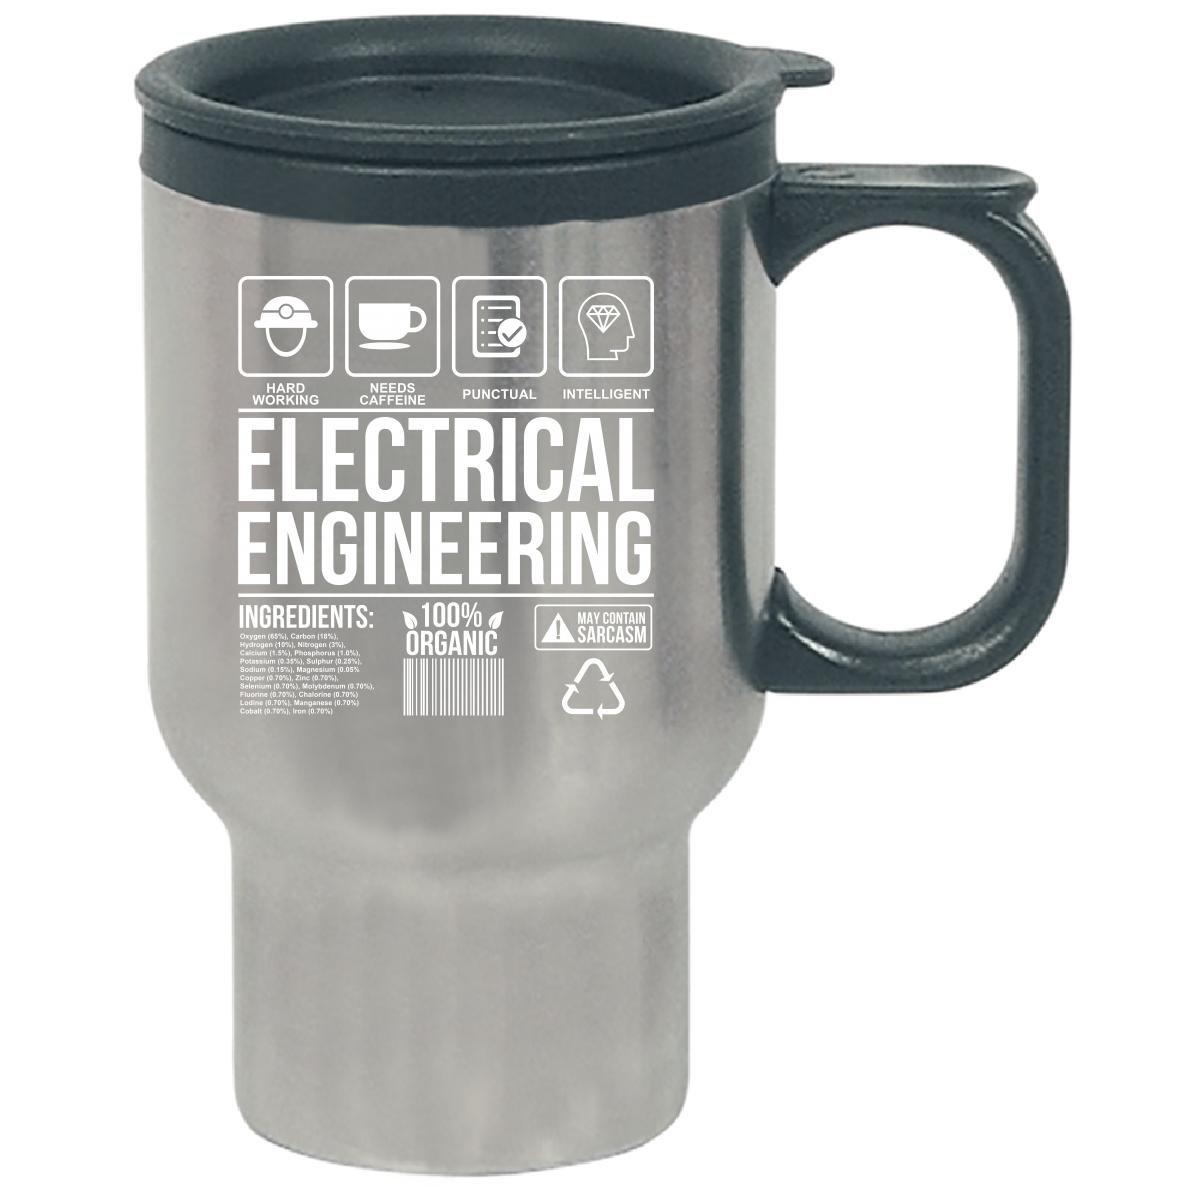 Electrical Engineering - Travel Mug